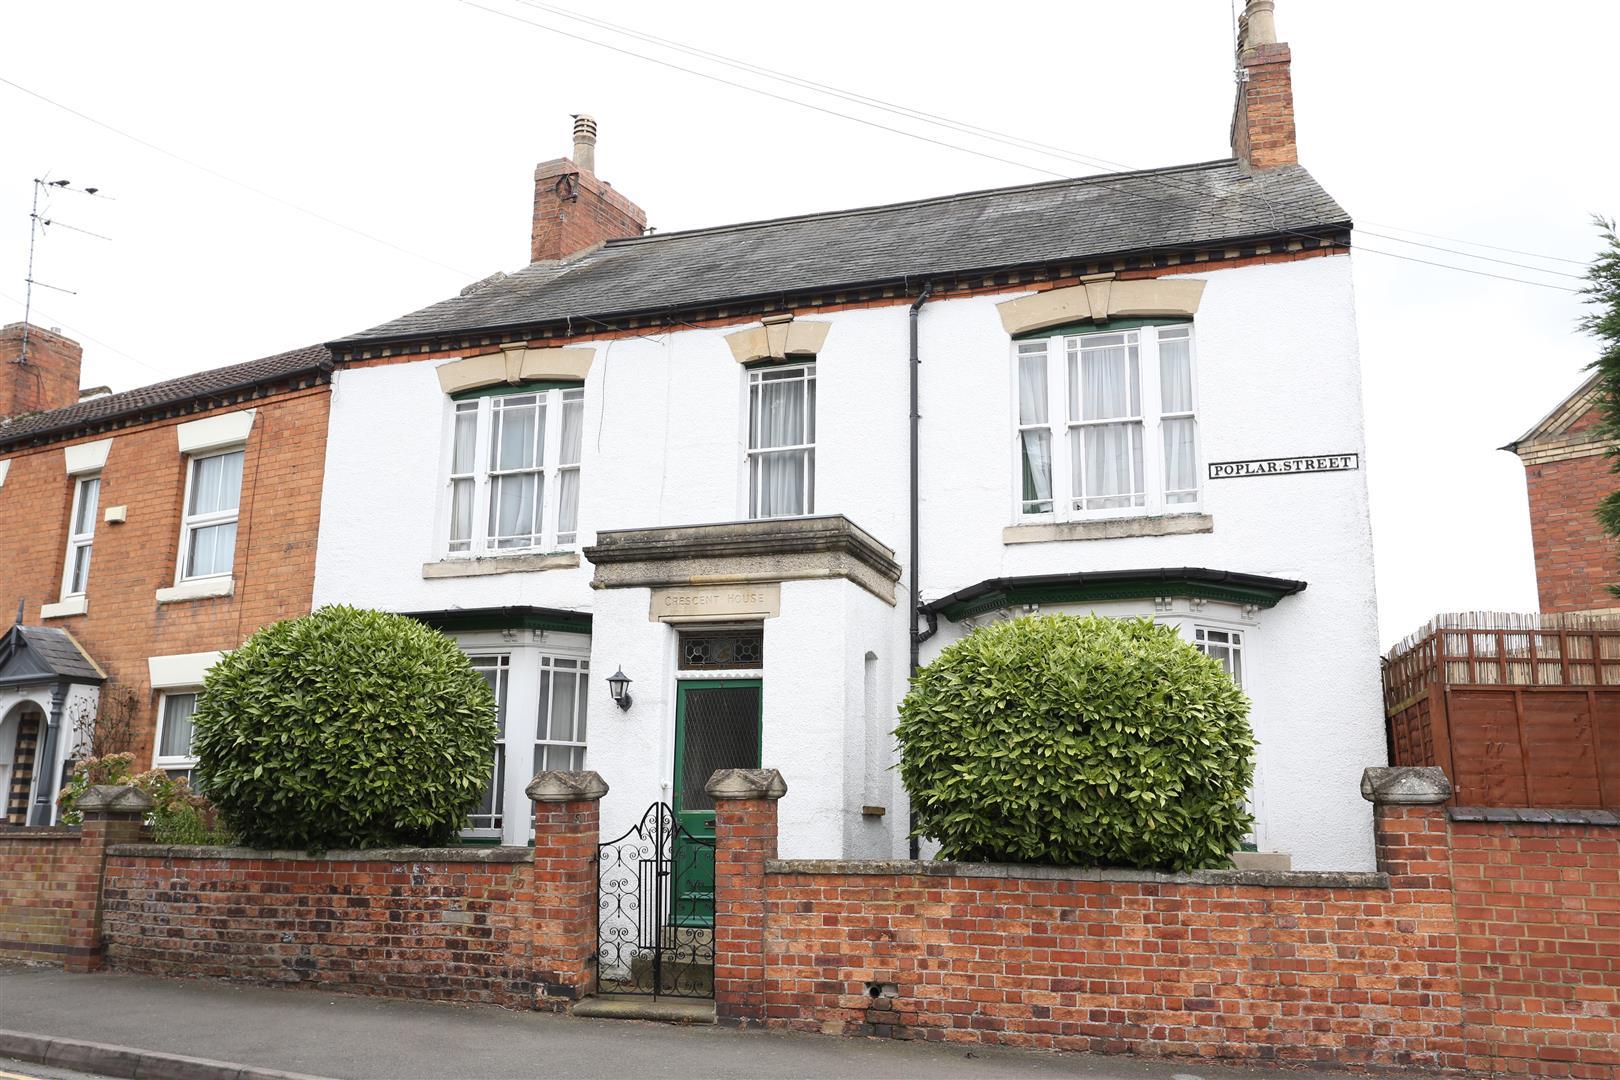 3 Bedrooms Semi Detached House for sale in Poplar Street, Wellingborough